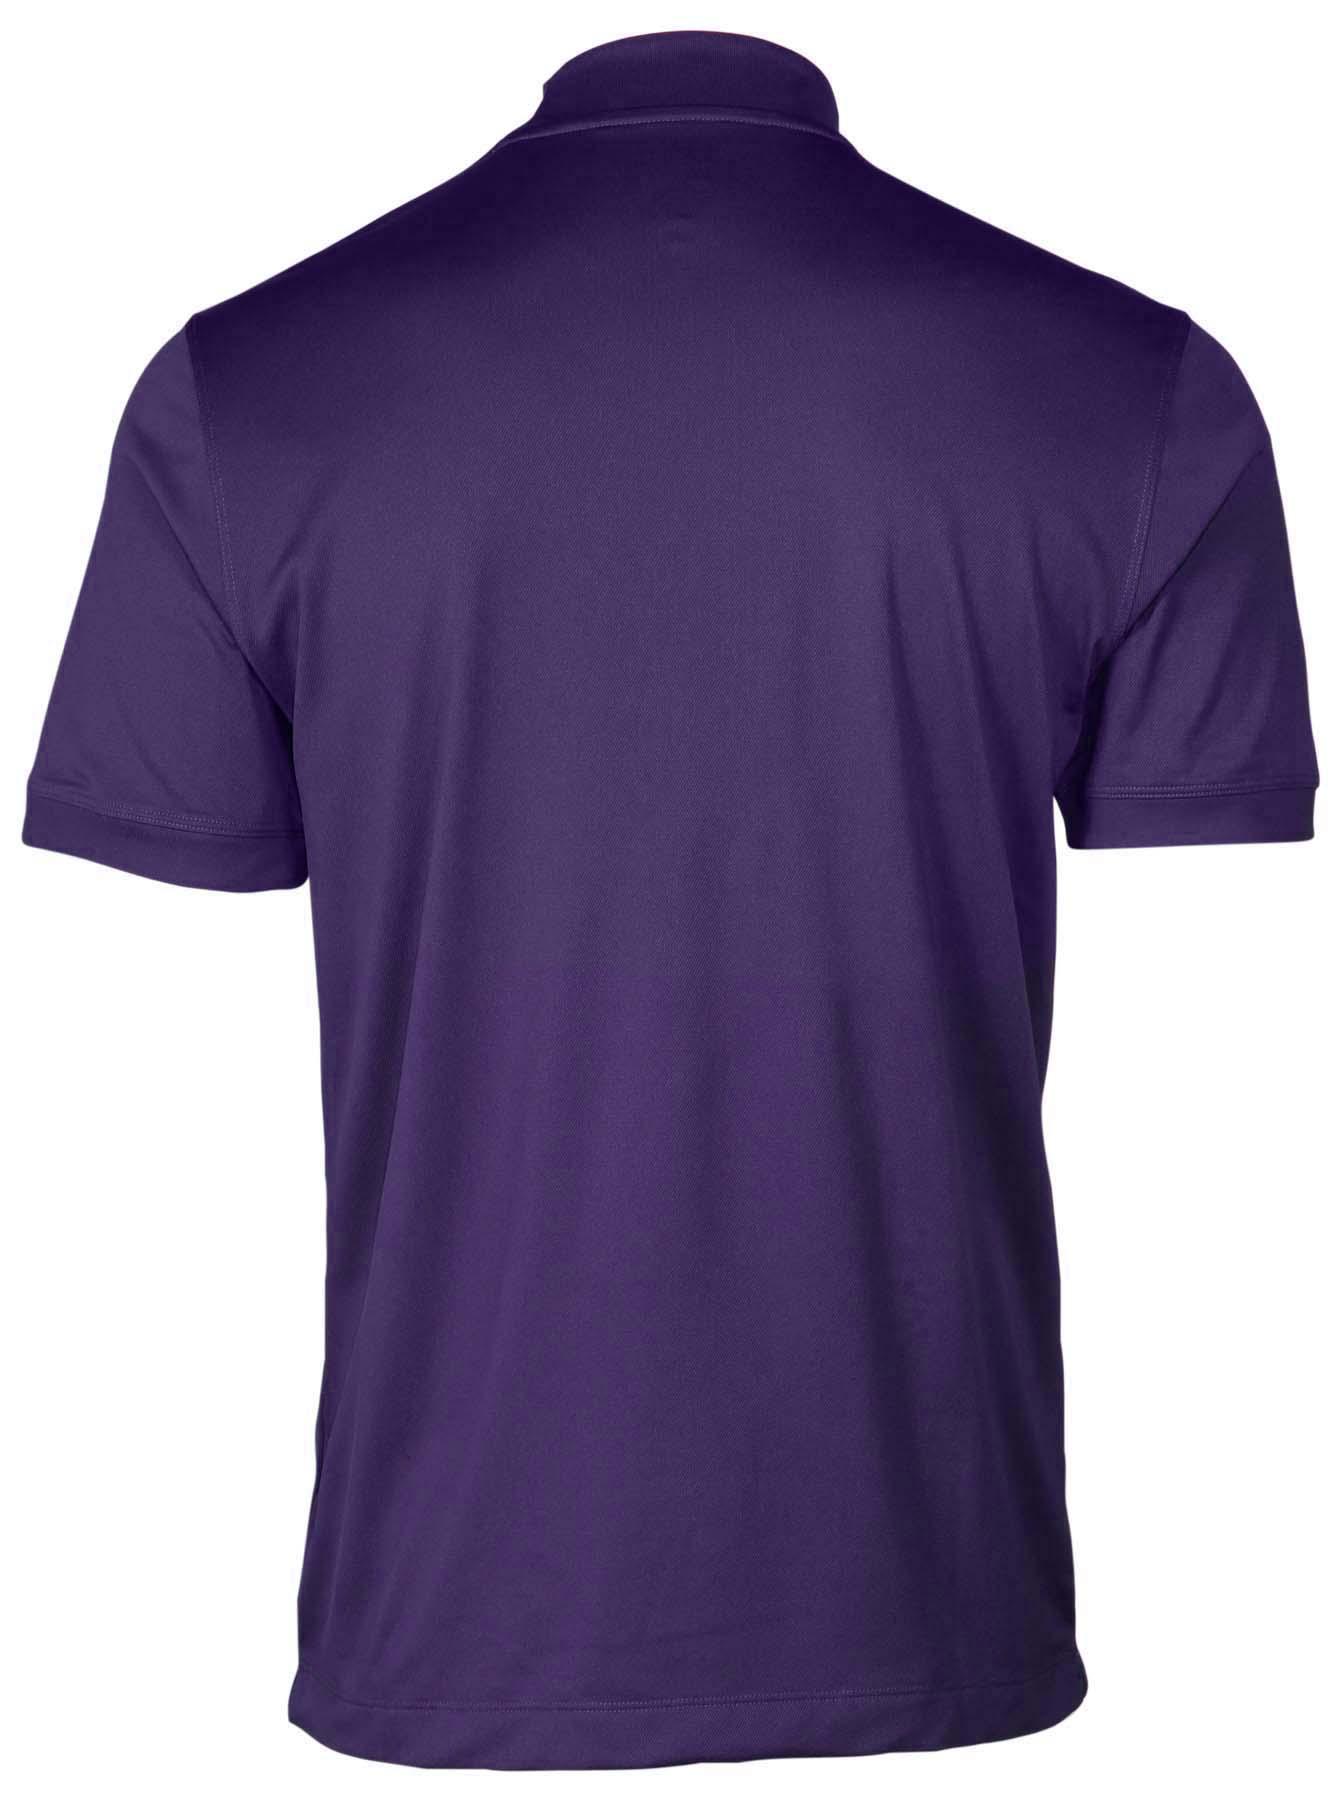 Nike men 39 s tech uv mock neck dri fit short sleeve shirt ebay for Nike short sleeve shirt